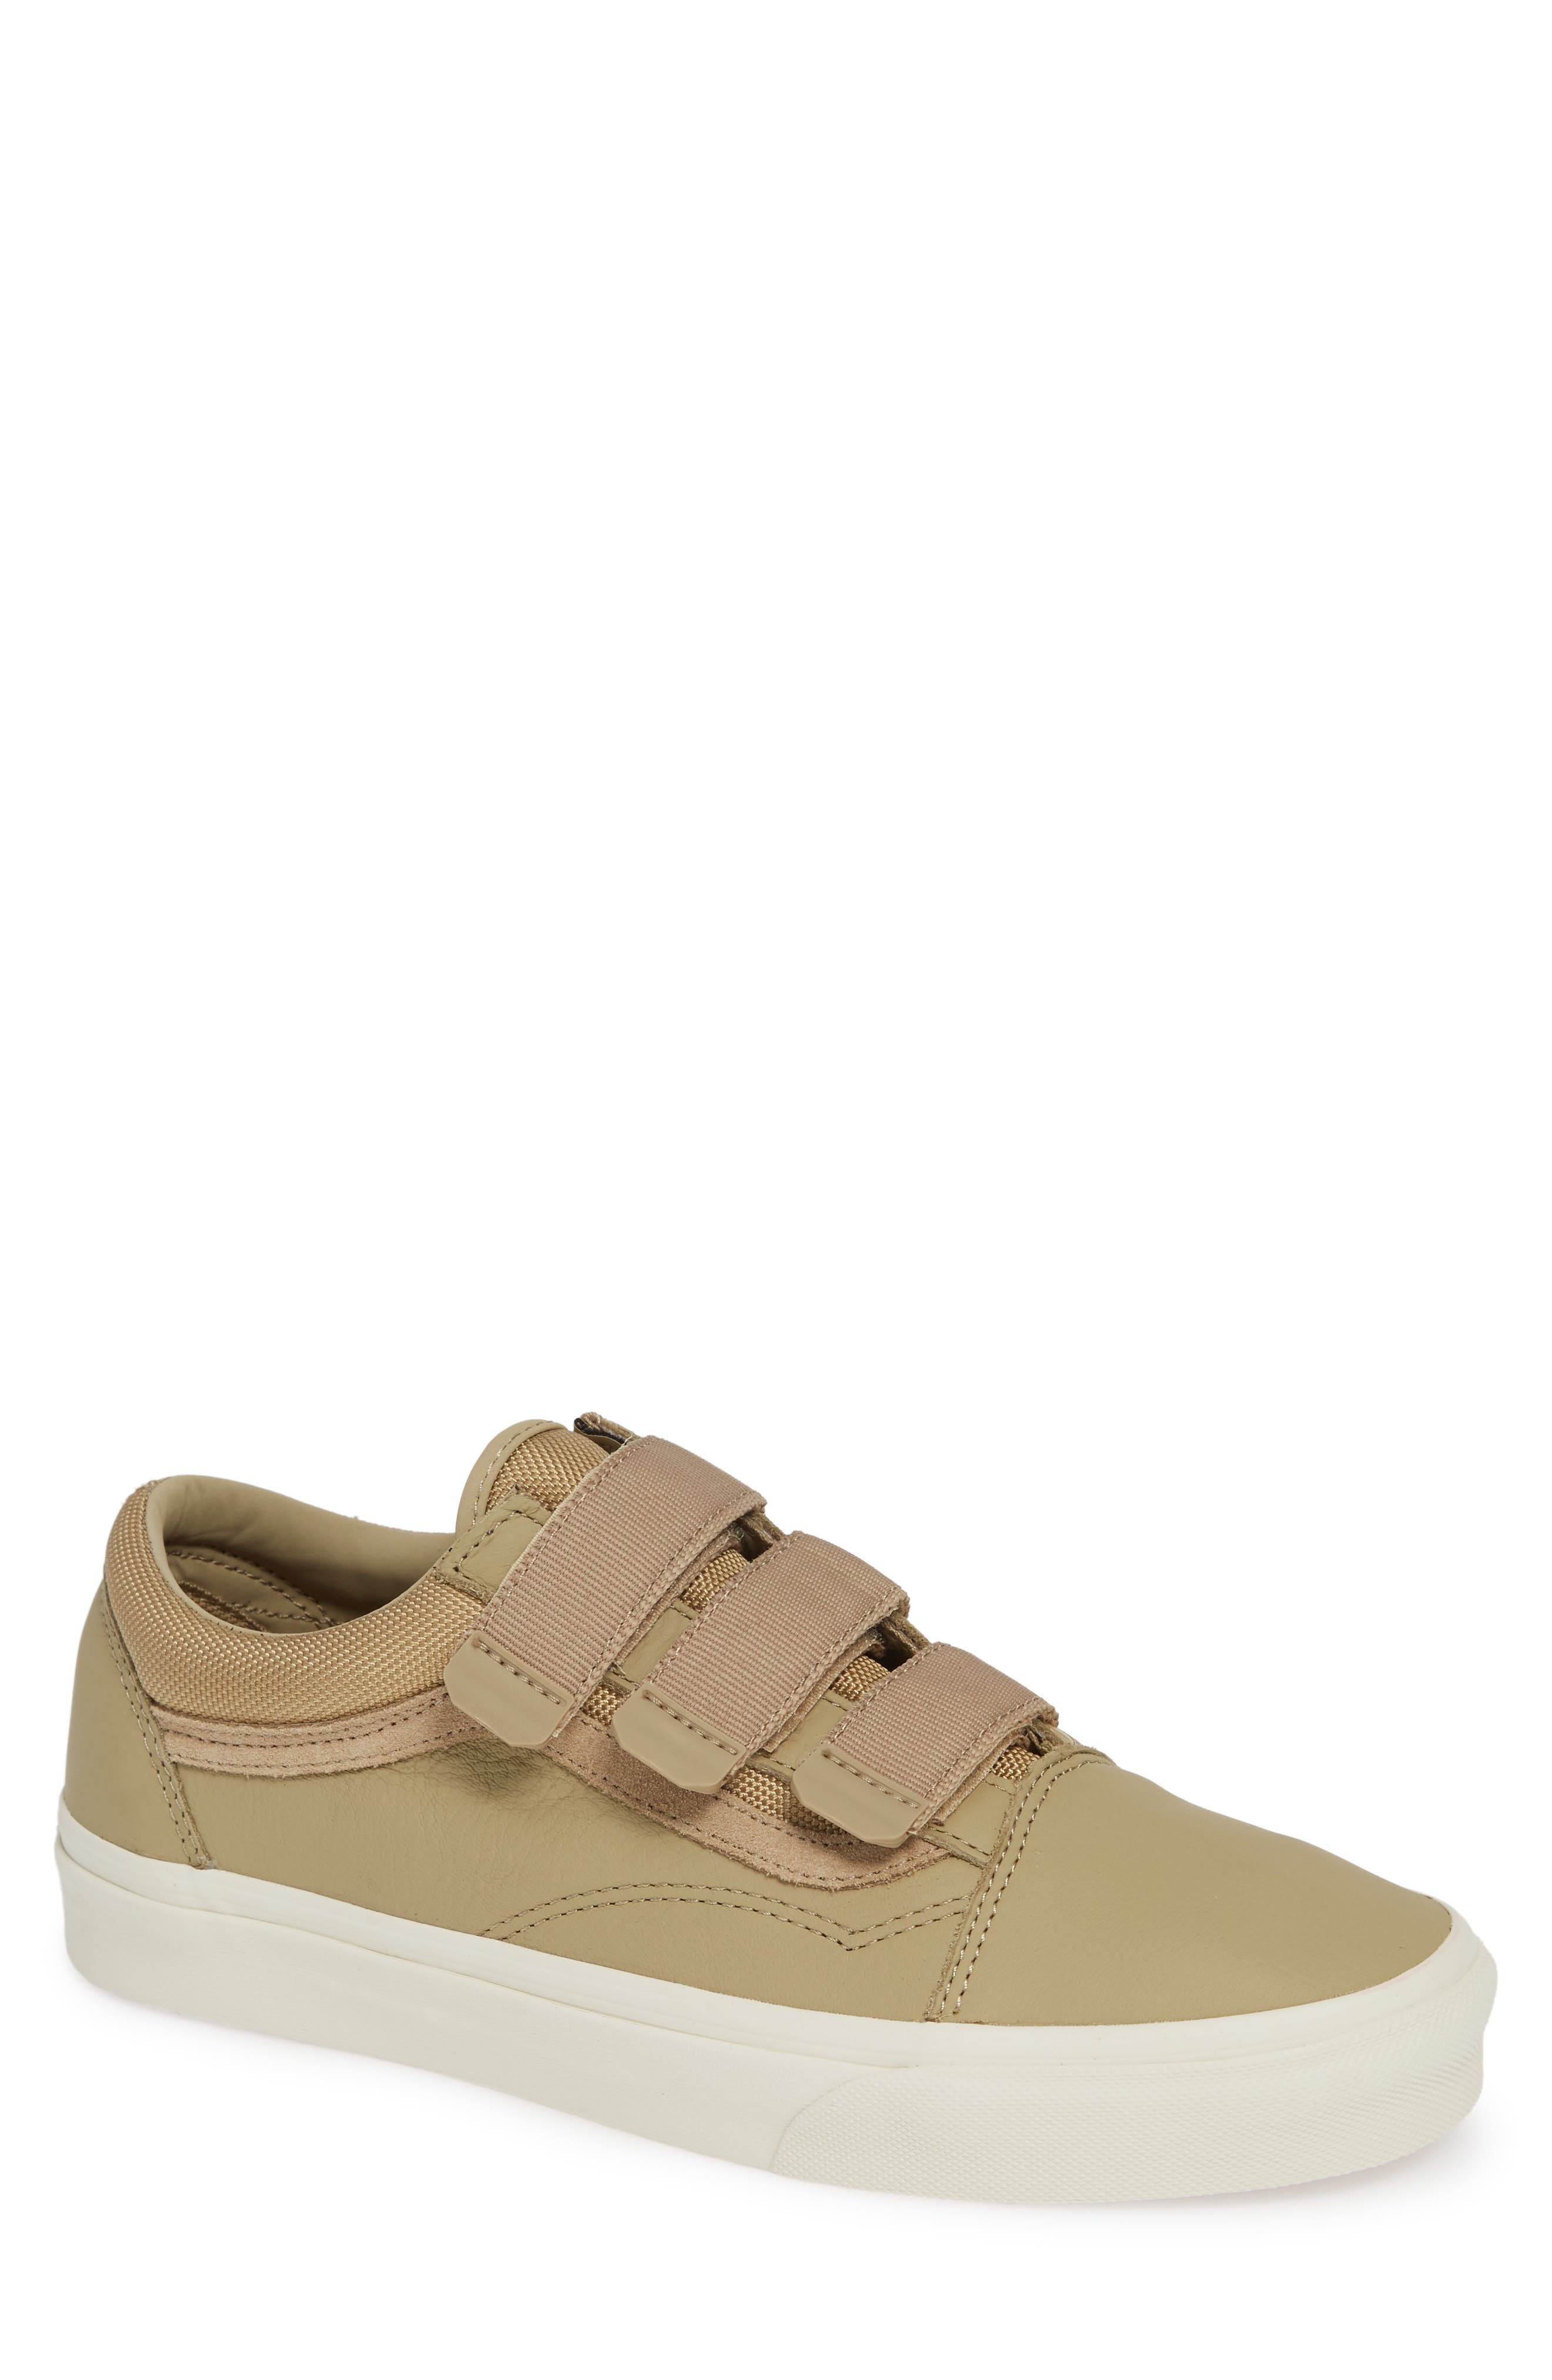 Old Skool V Sneaker,                             Main thumbnail 1, color,                             BEIGE CORNSTALK